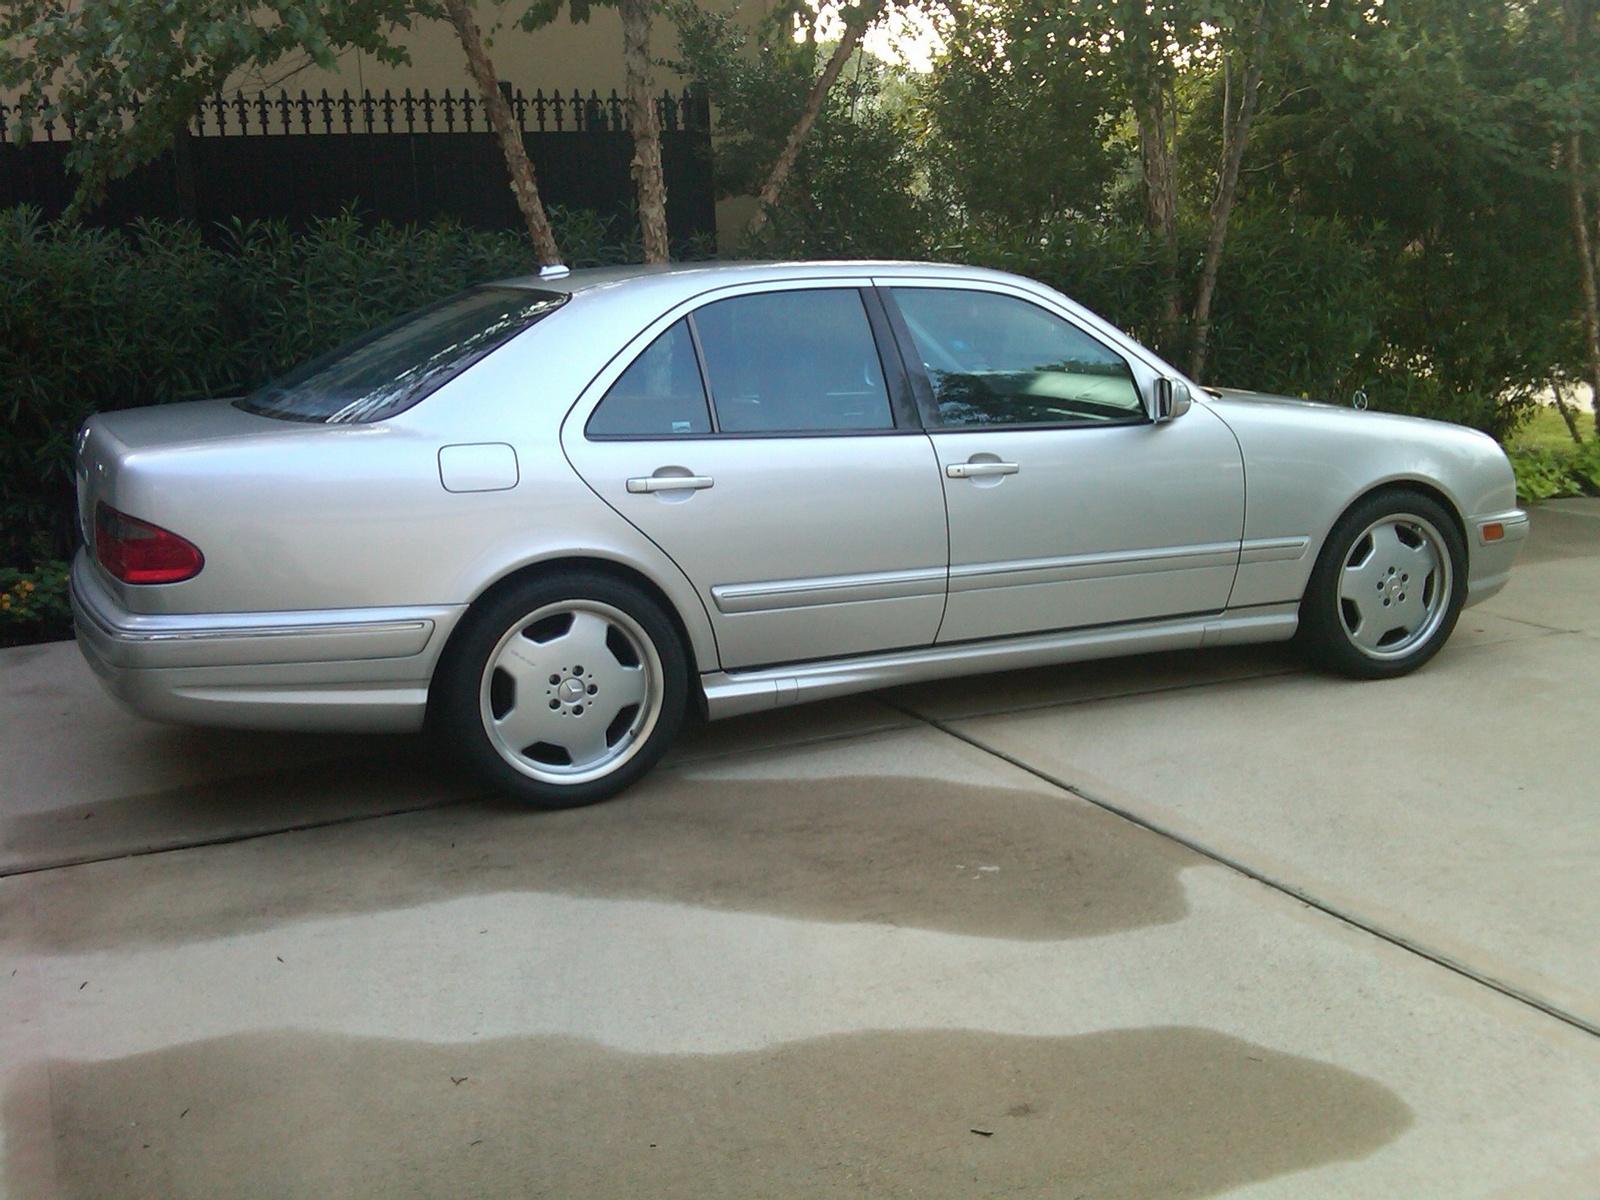 2002 mercedes benz e class pictures cargurus for Mercedes benz amg e class